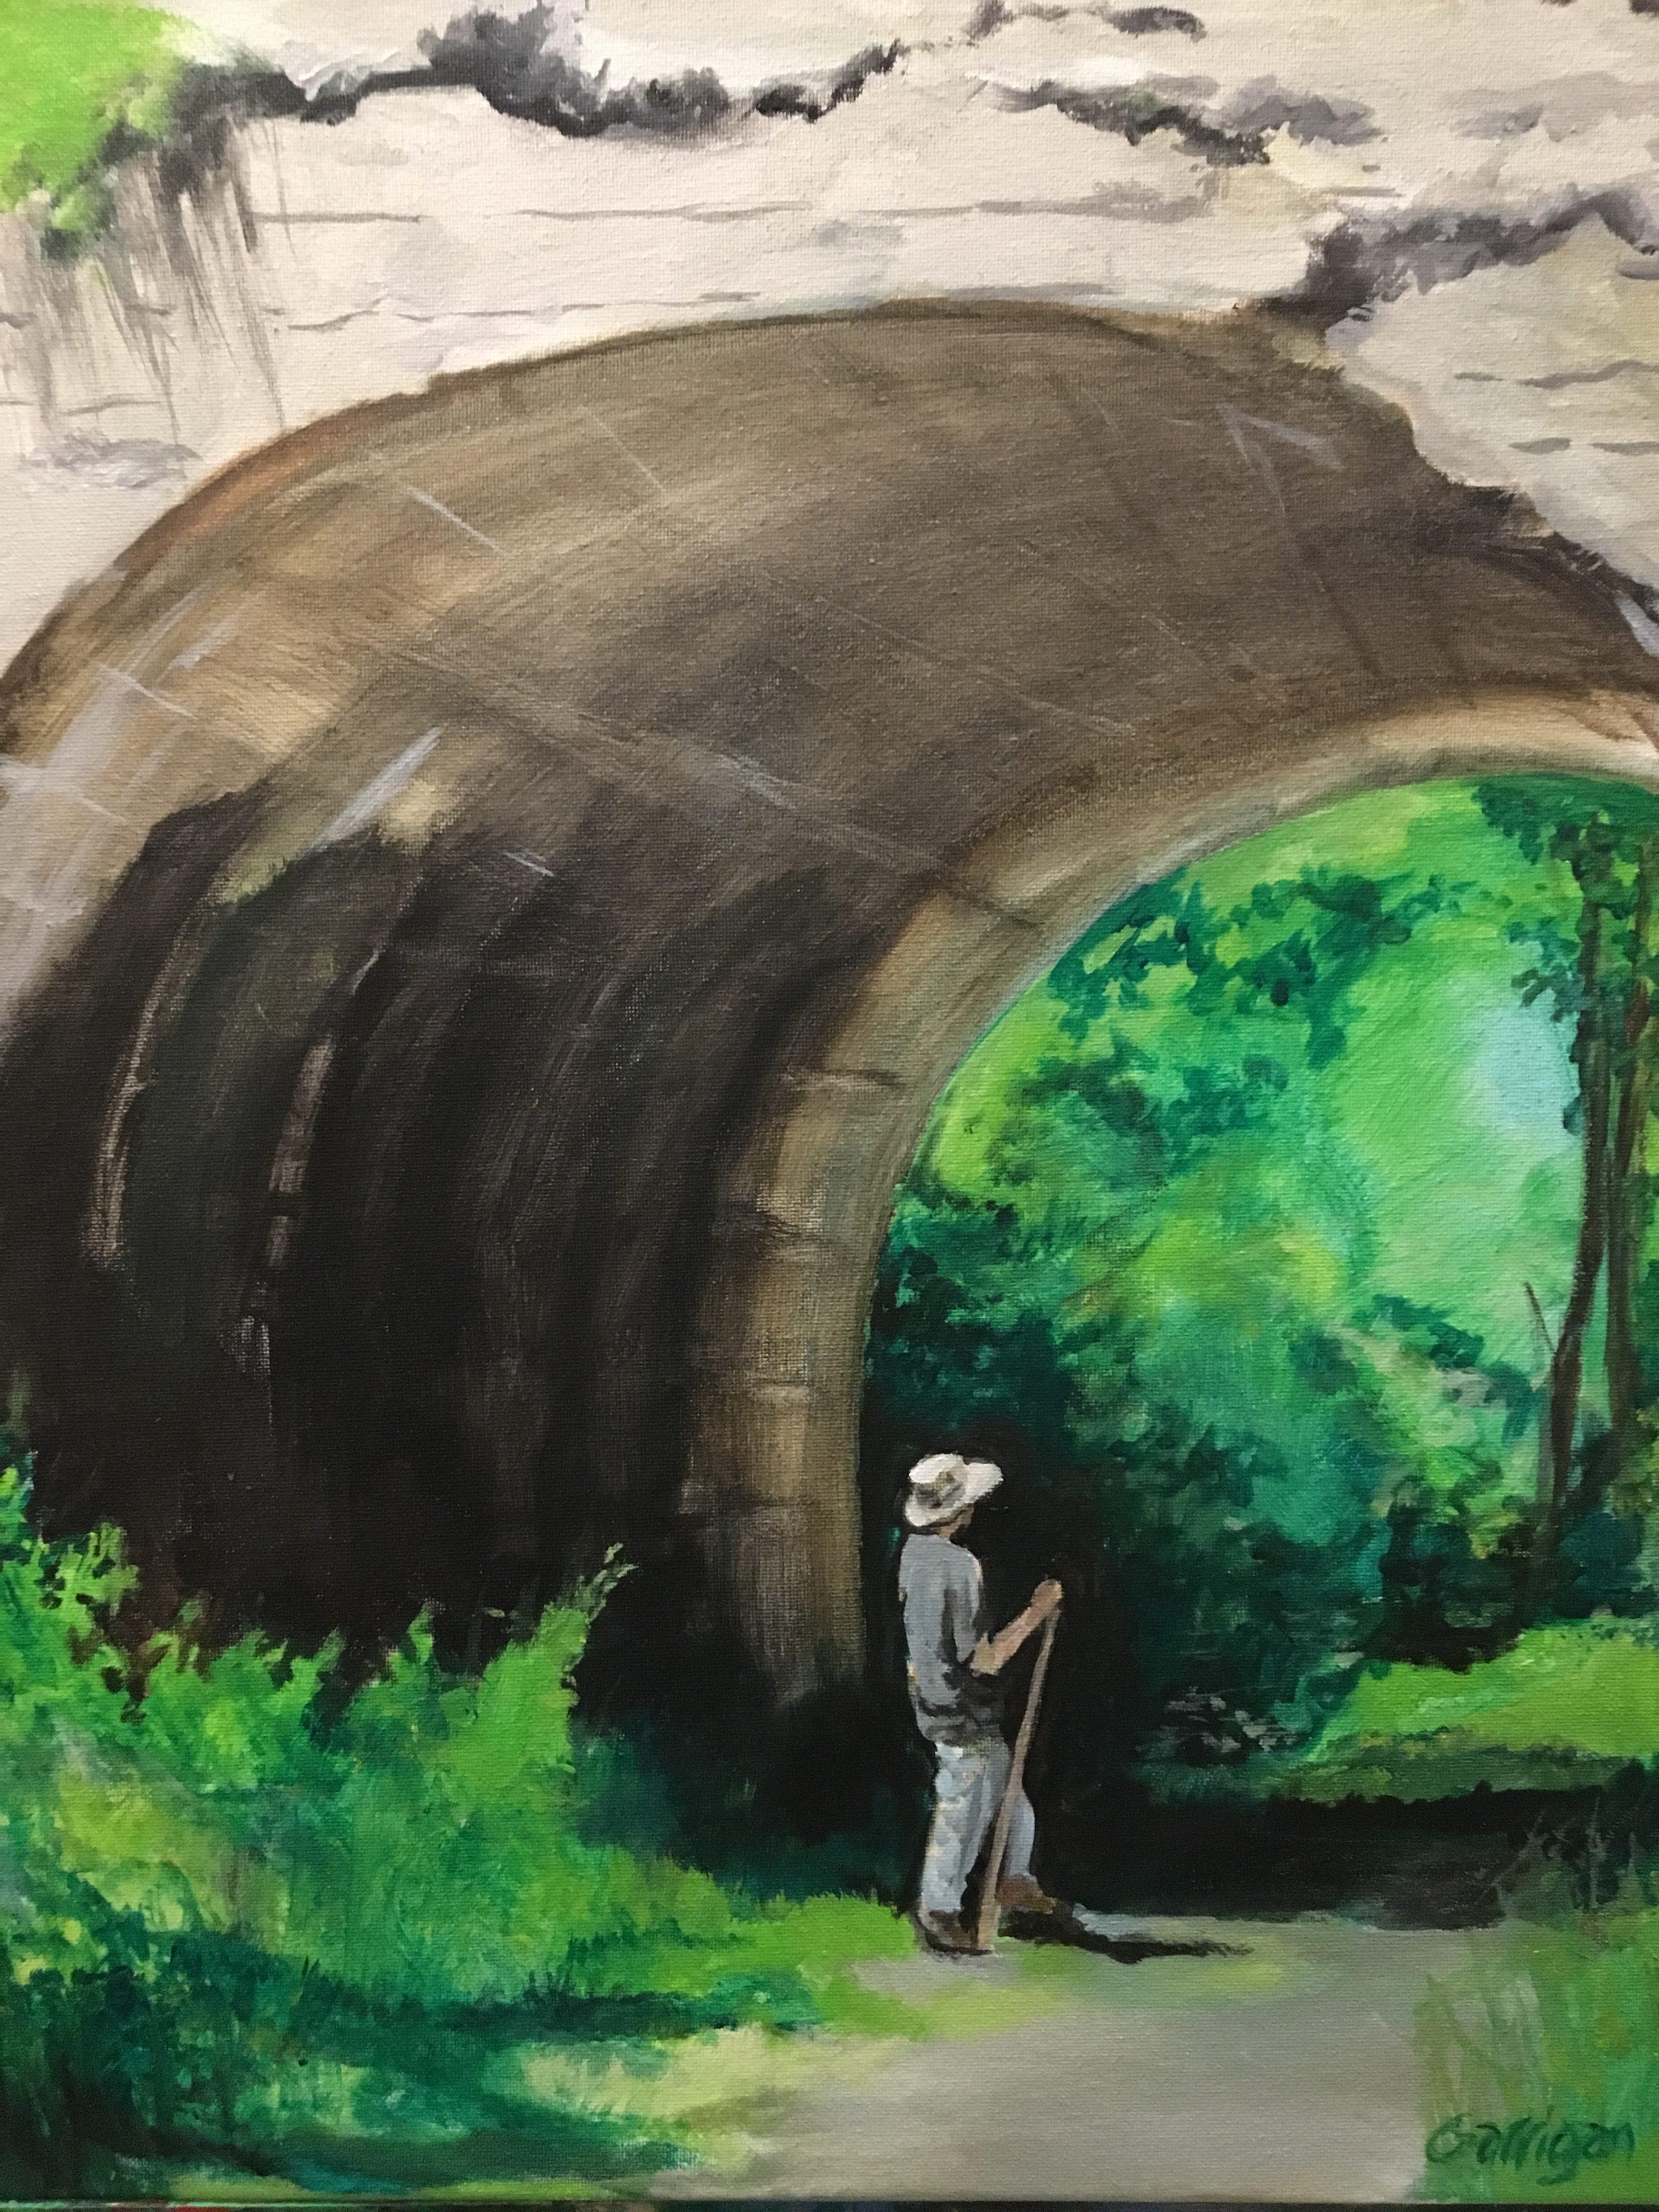 Paleontologist – Garrigan 2019